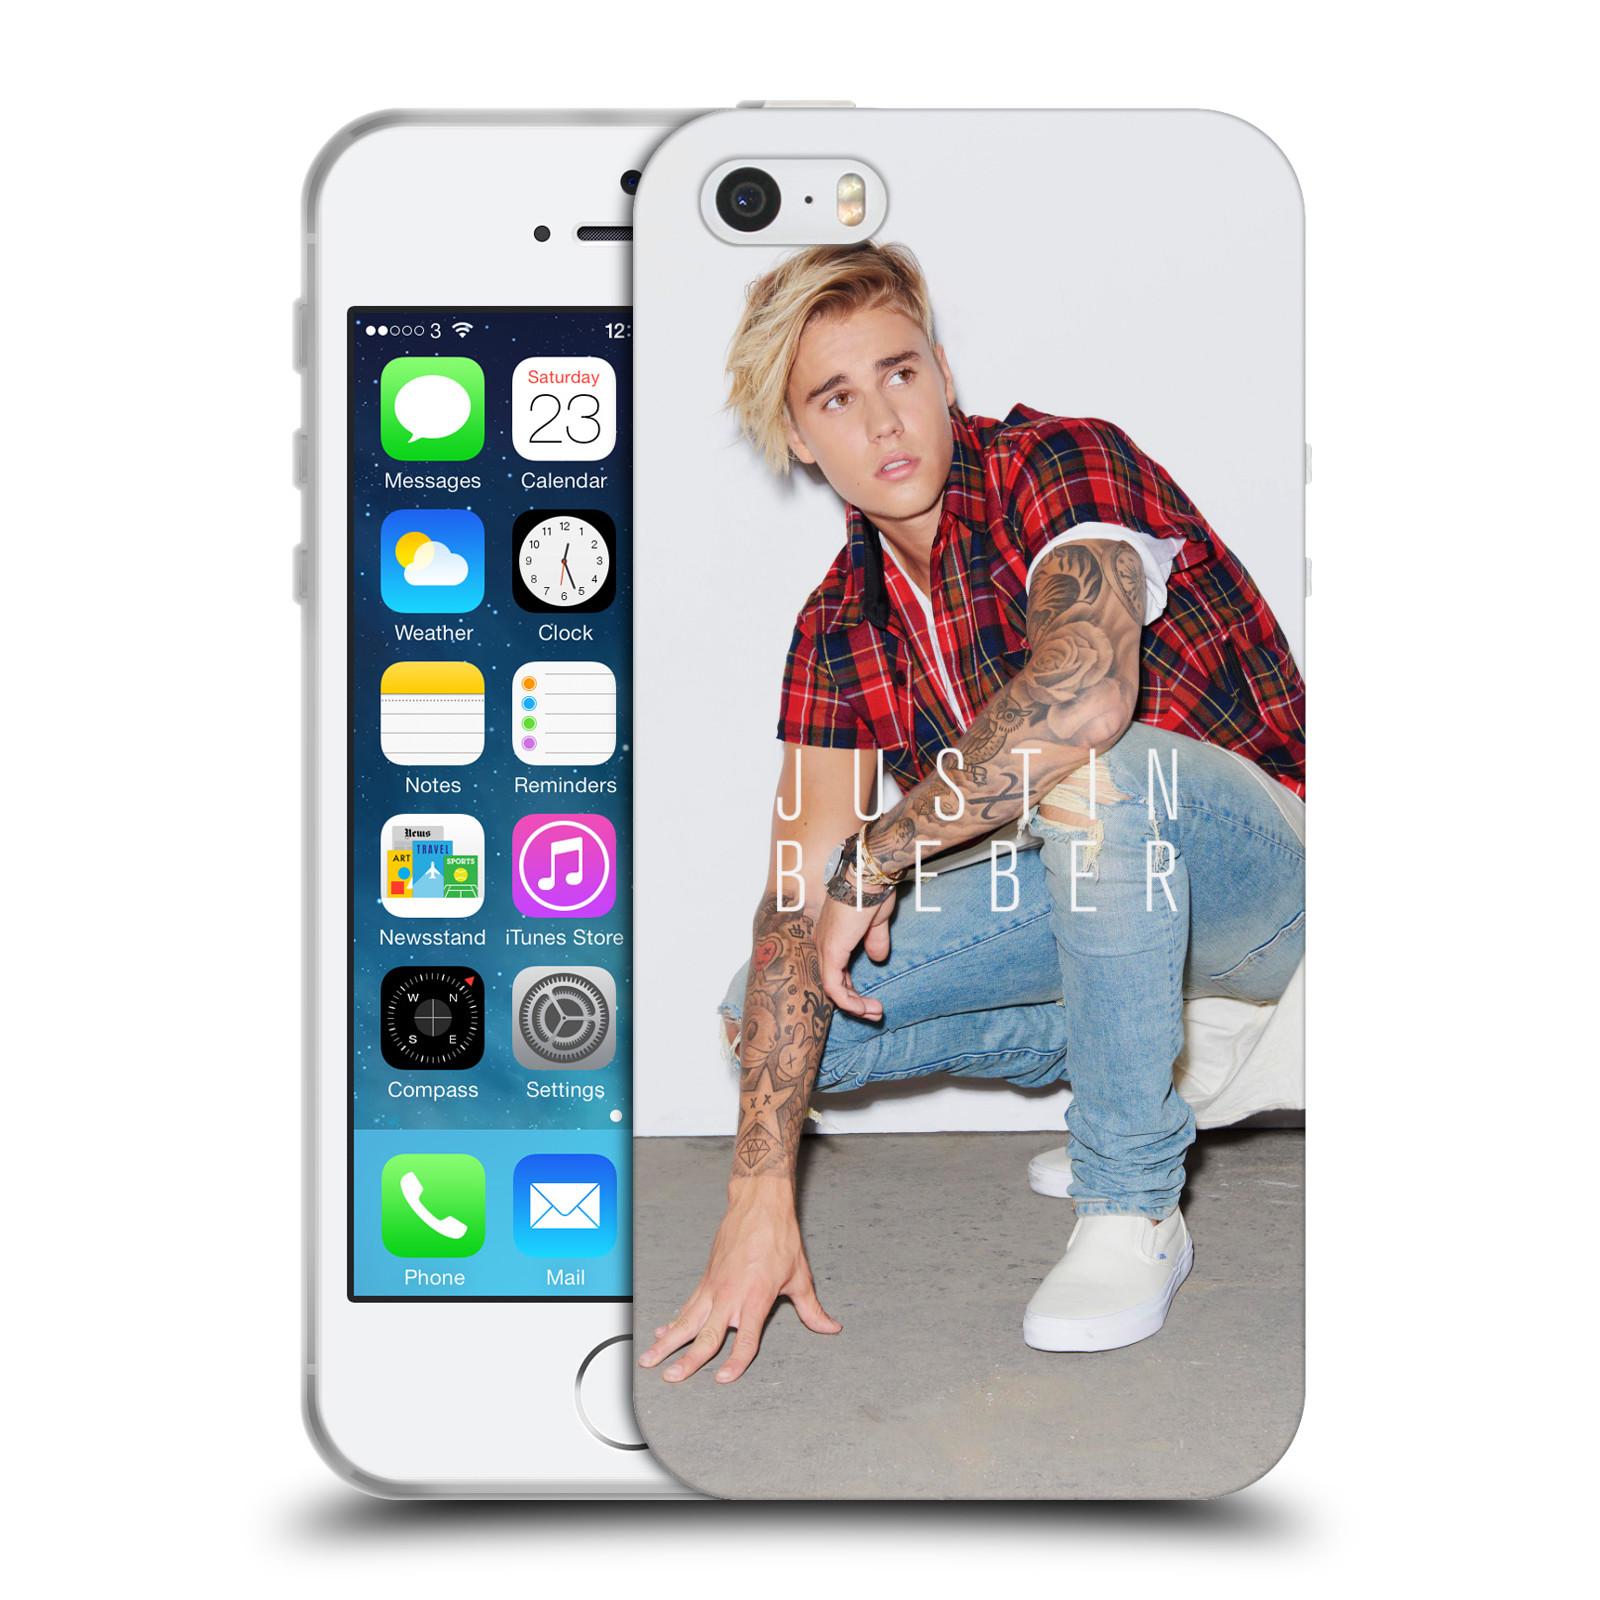 HEAD CASE silikonový obal na mobil Apple Iphone 5 / 5S originální potisk Justin Bieber Uncropped